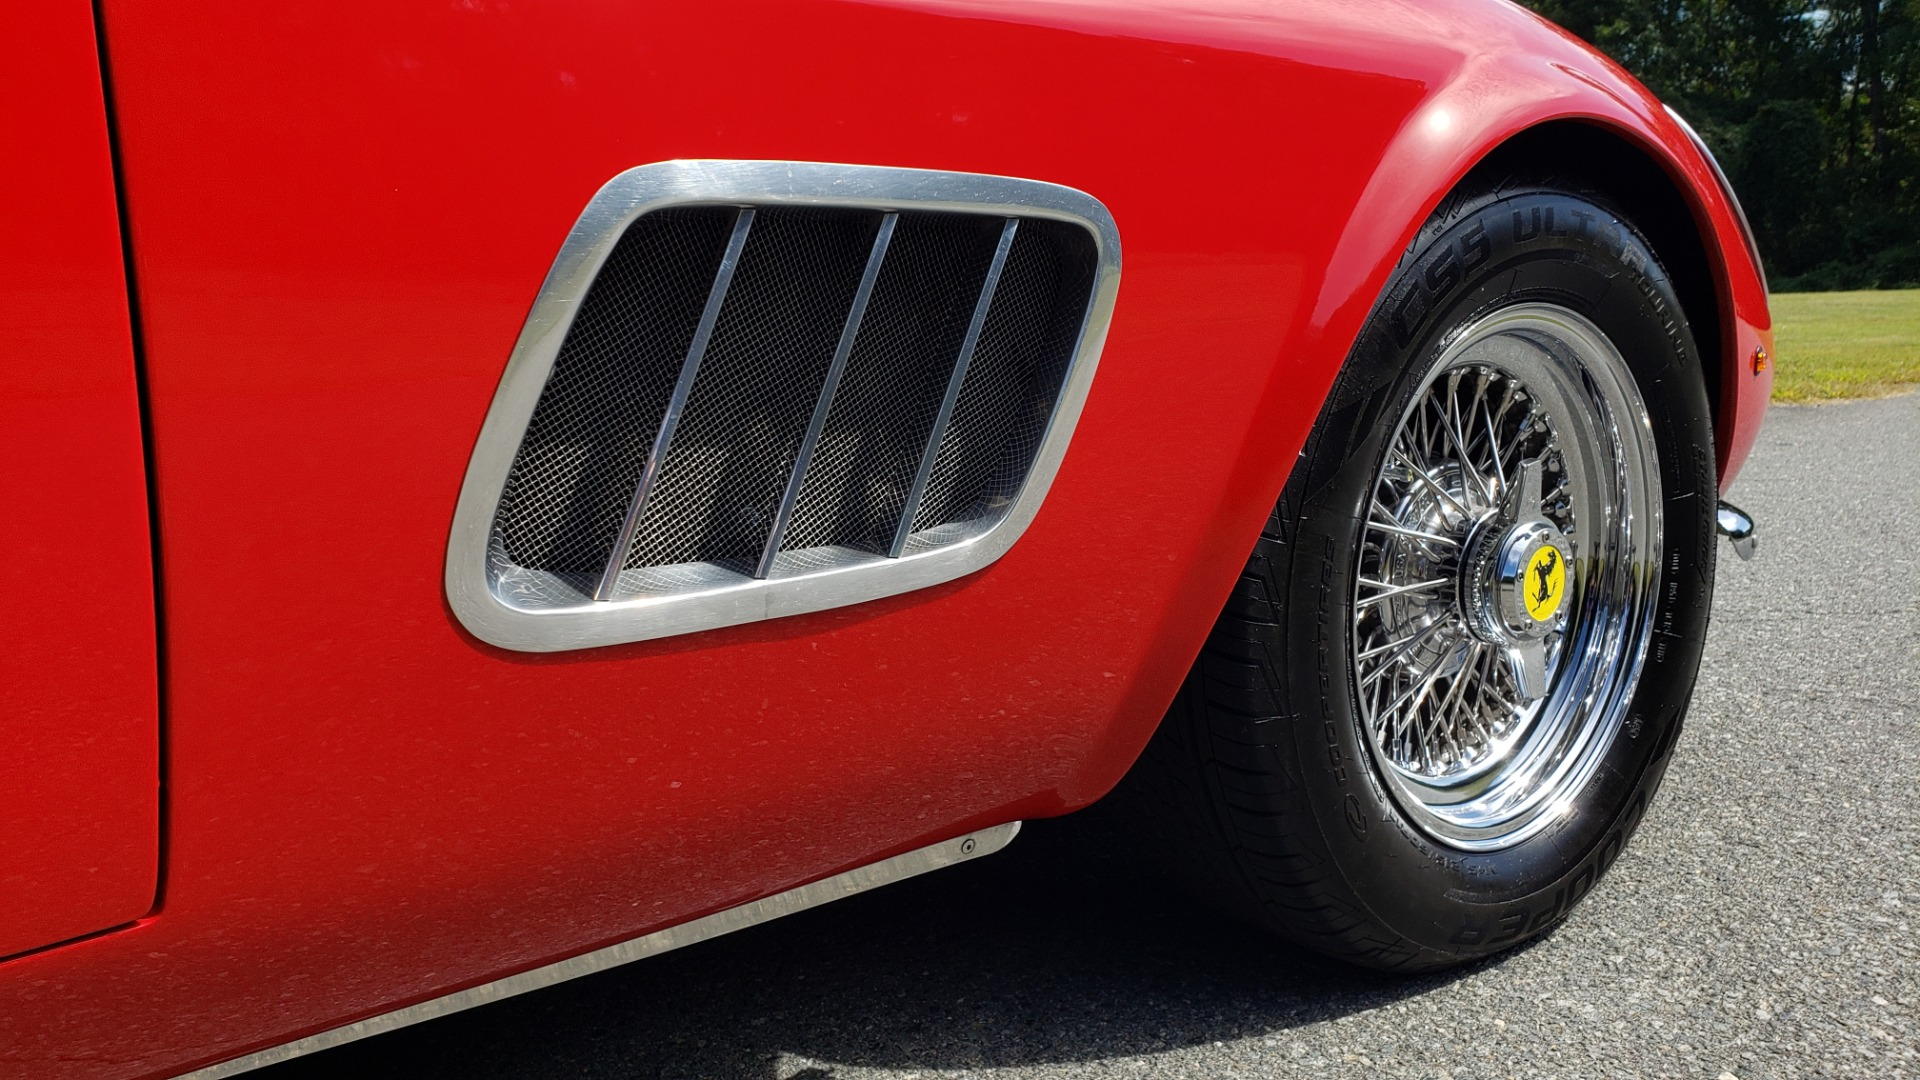 Used 1961 Ferrari 250GT SWB CALIFORNIA REPLICA / 302CI V8 / TREMEC 5-SPEED for sale Sold at Formula Imports in Charlotte NC 28227 8